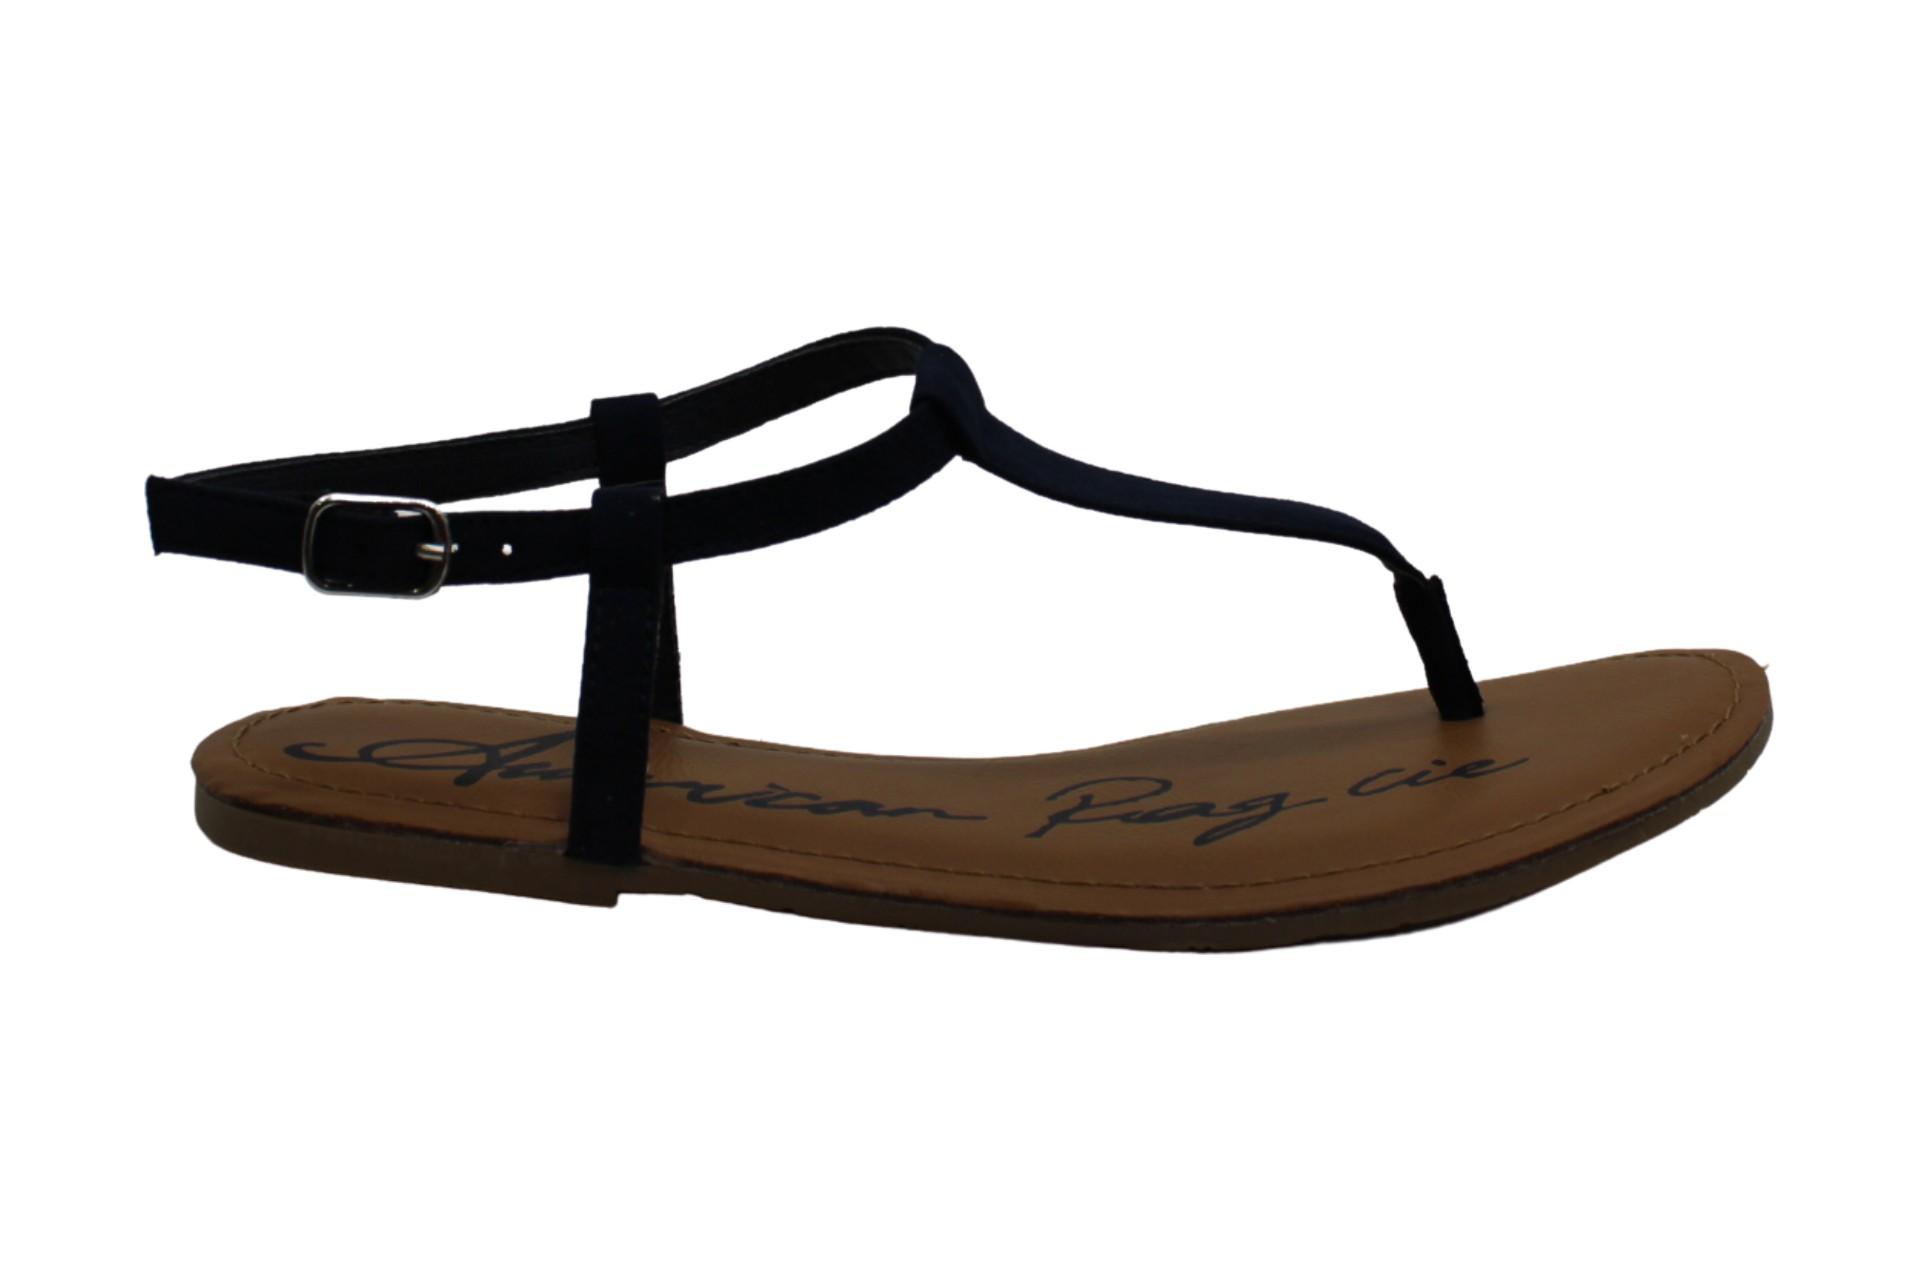 American Rag Womens Krista Open Toe Casual T-Strap Sandals Blue Size 8.0 M US